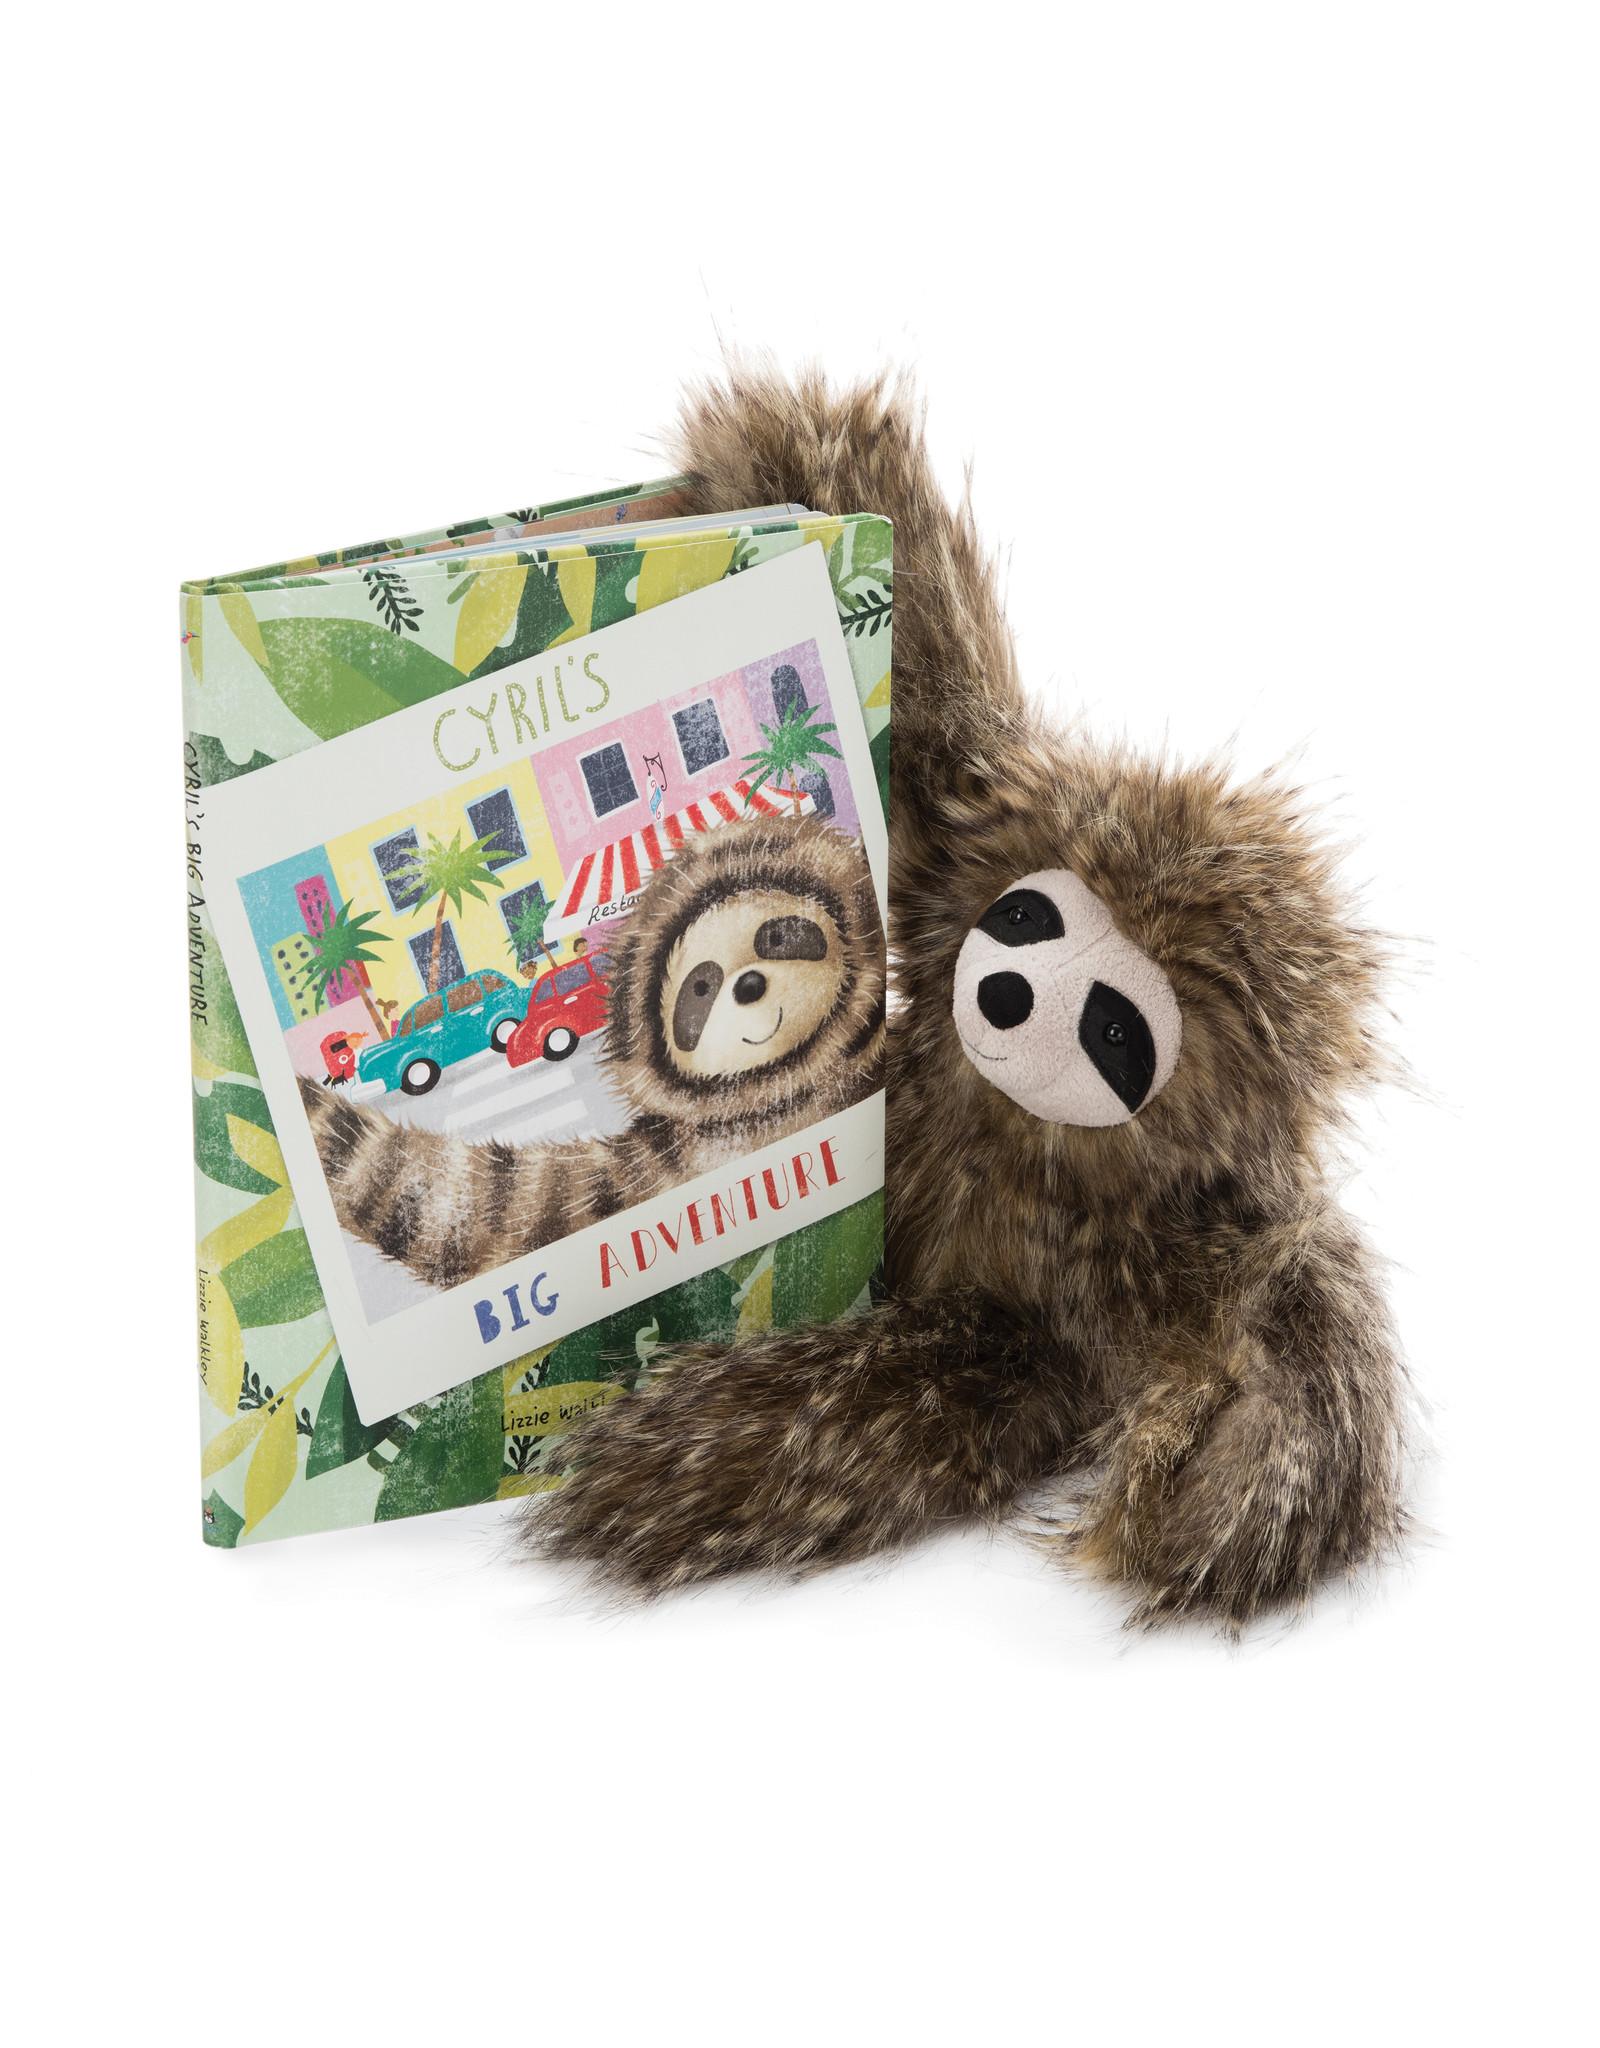 Jellycat Book, Cyril's Big Adventure